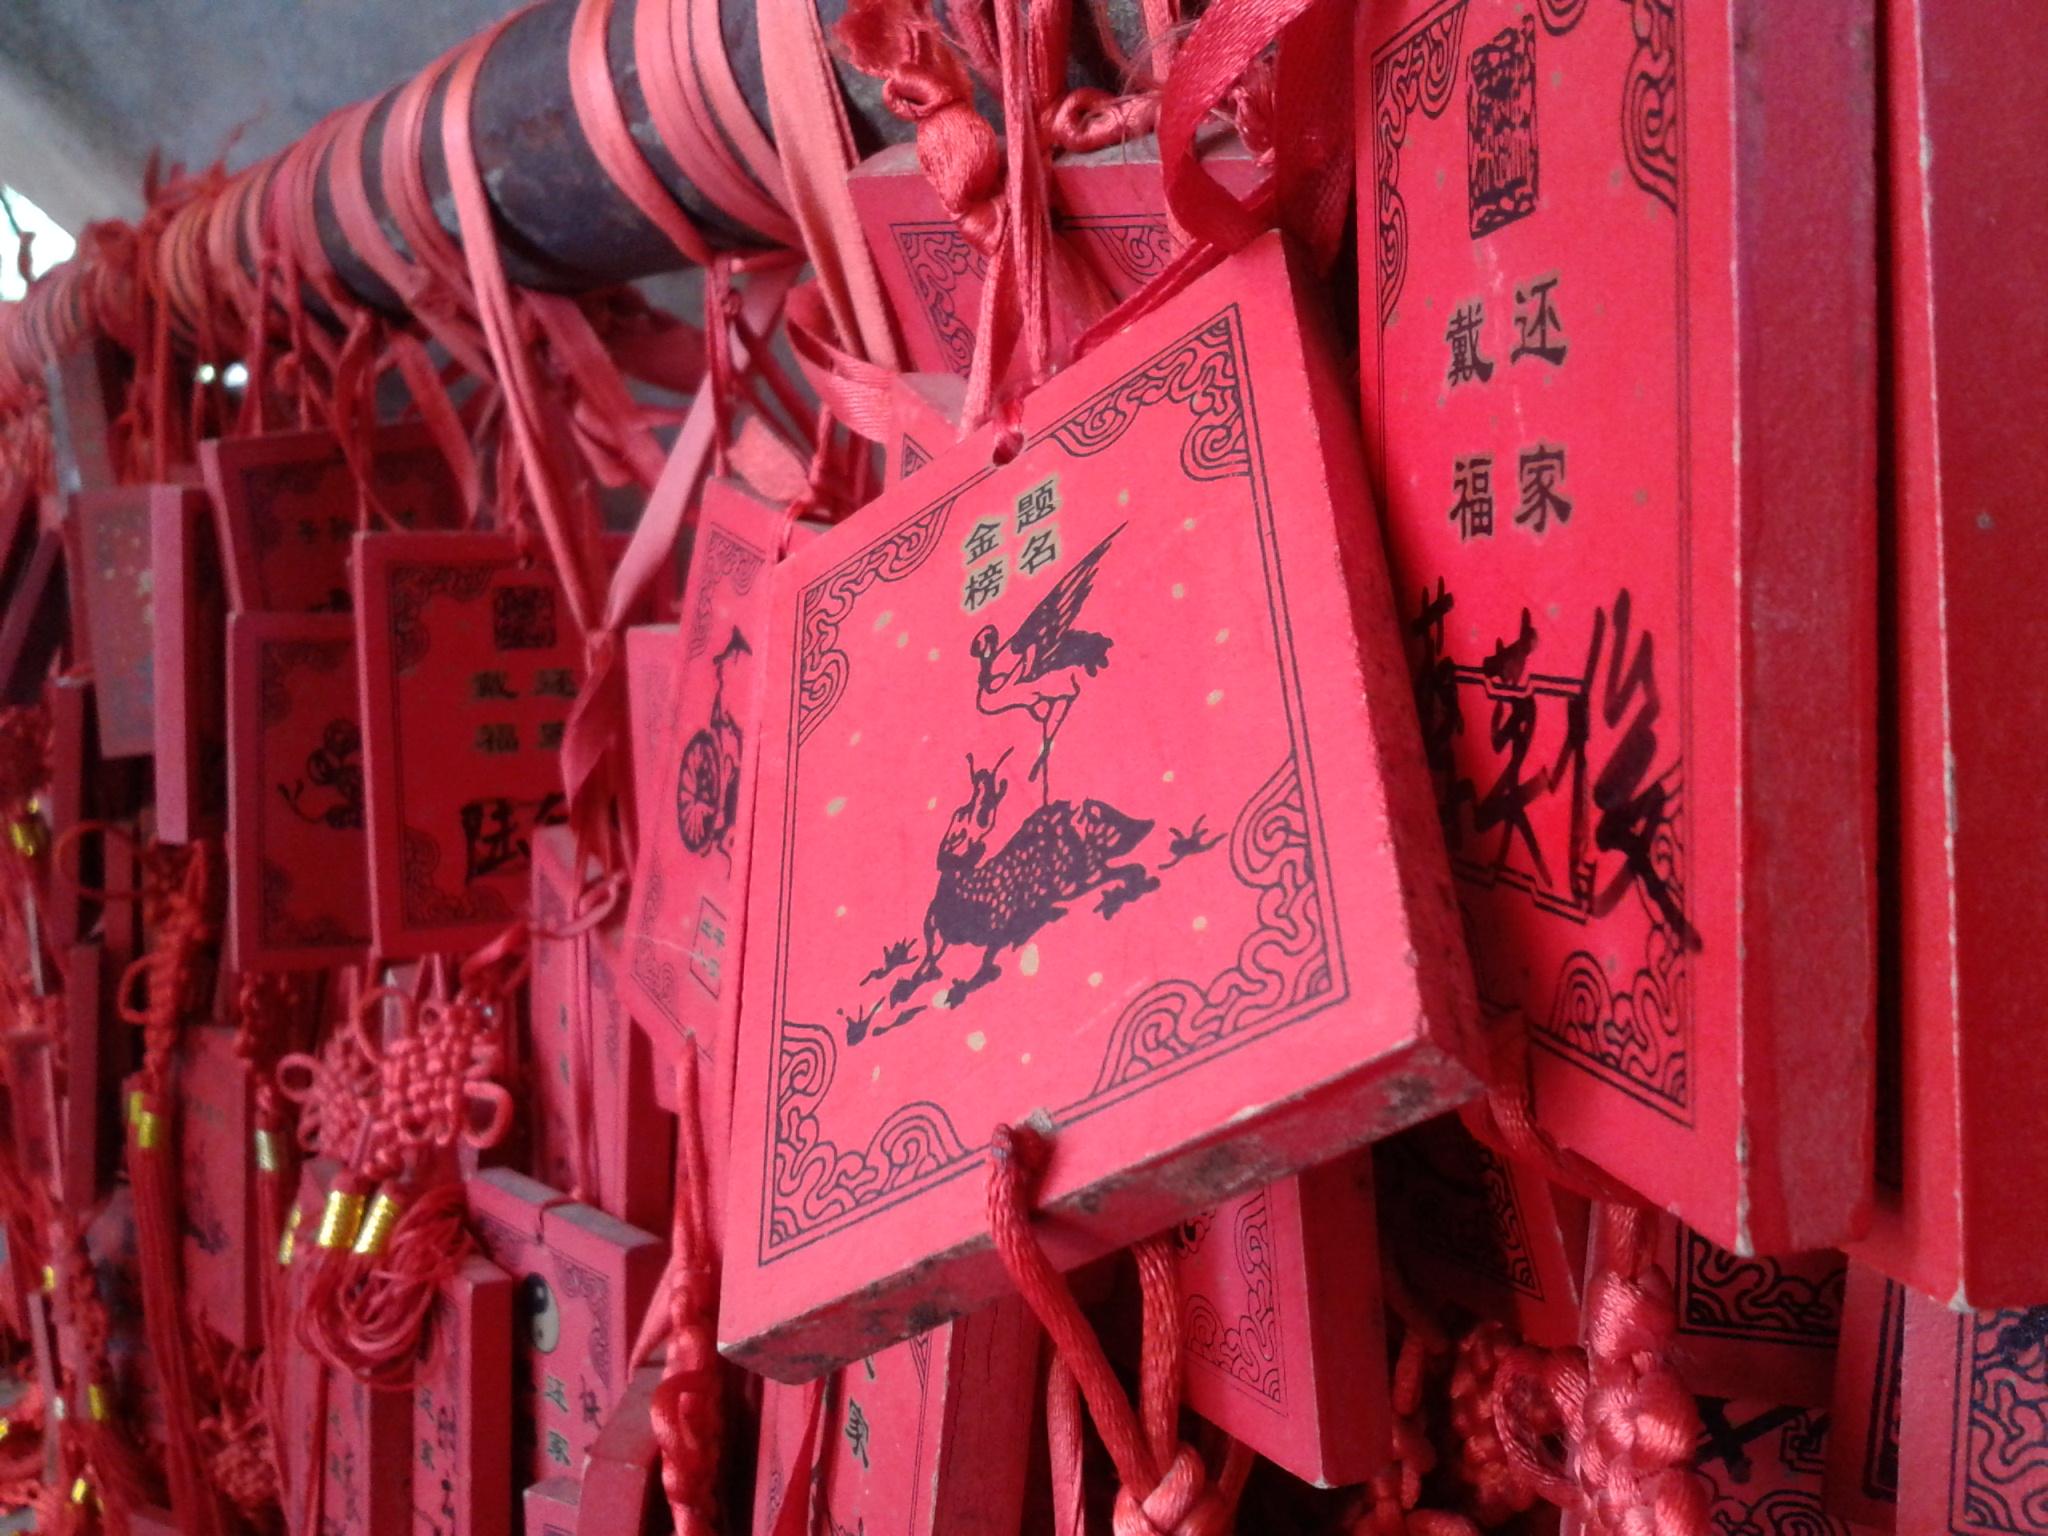 Kívánságok - Ming-sírok (十三陵), Peking